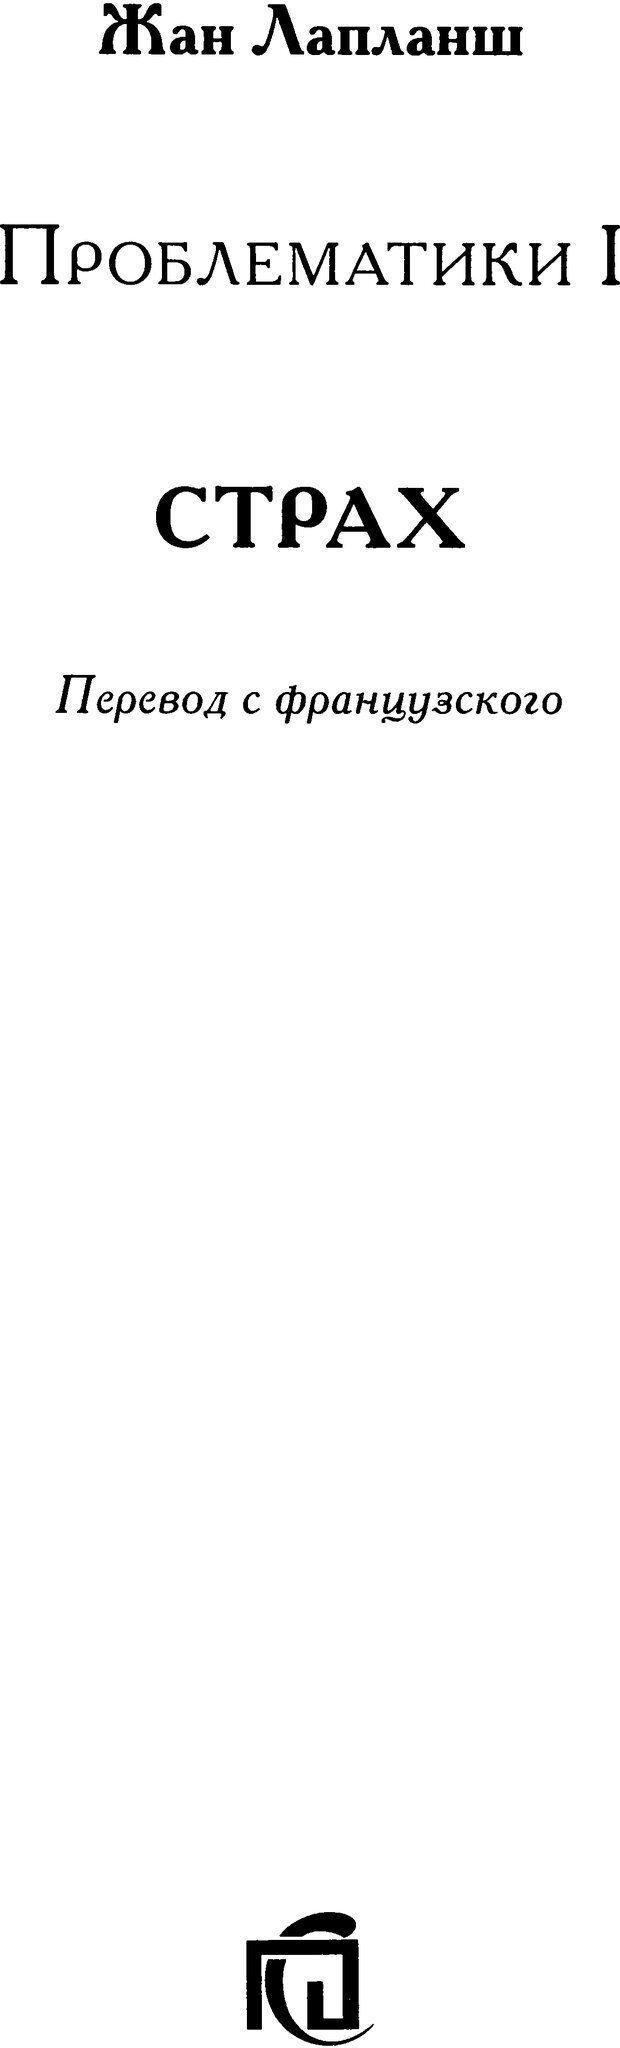 DJVU. Проблематики I. Страх. Лапланш Ж. Страница 3. Читать онлайн